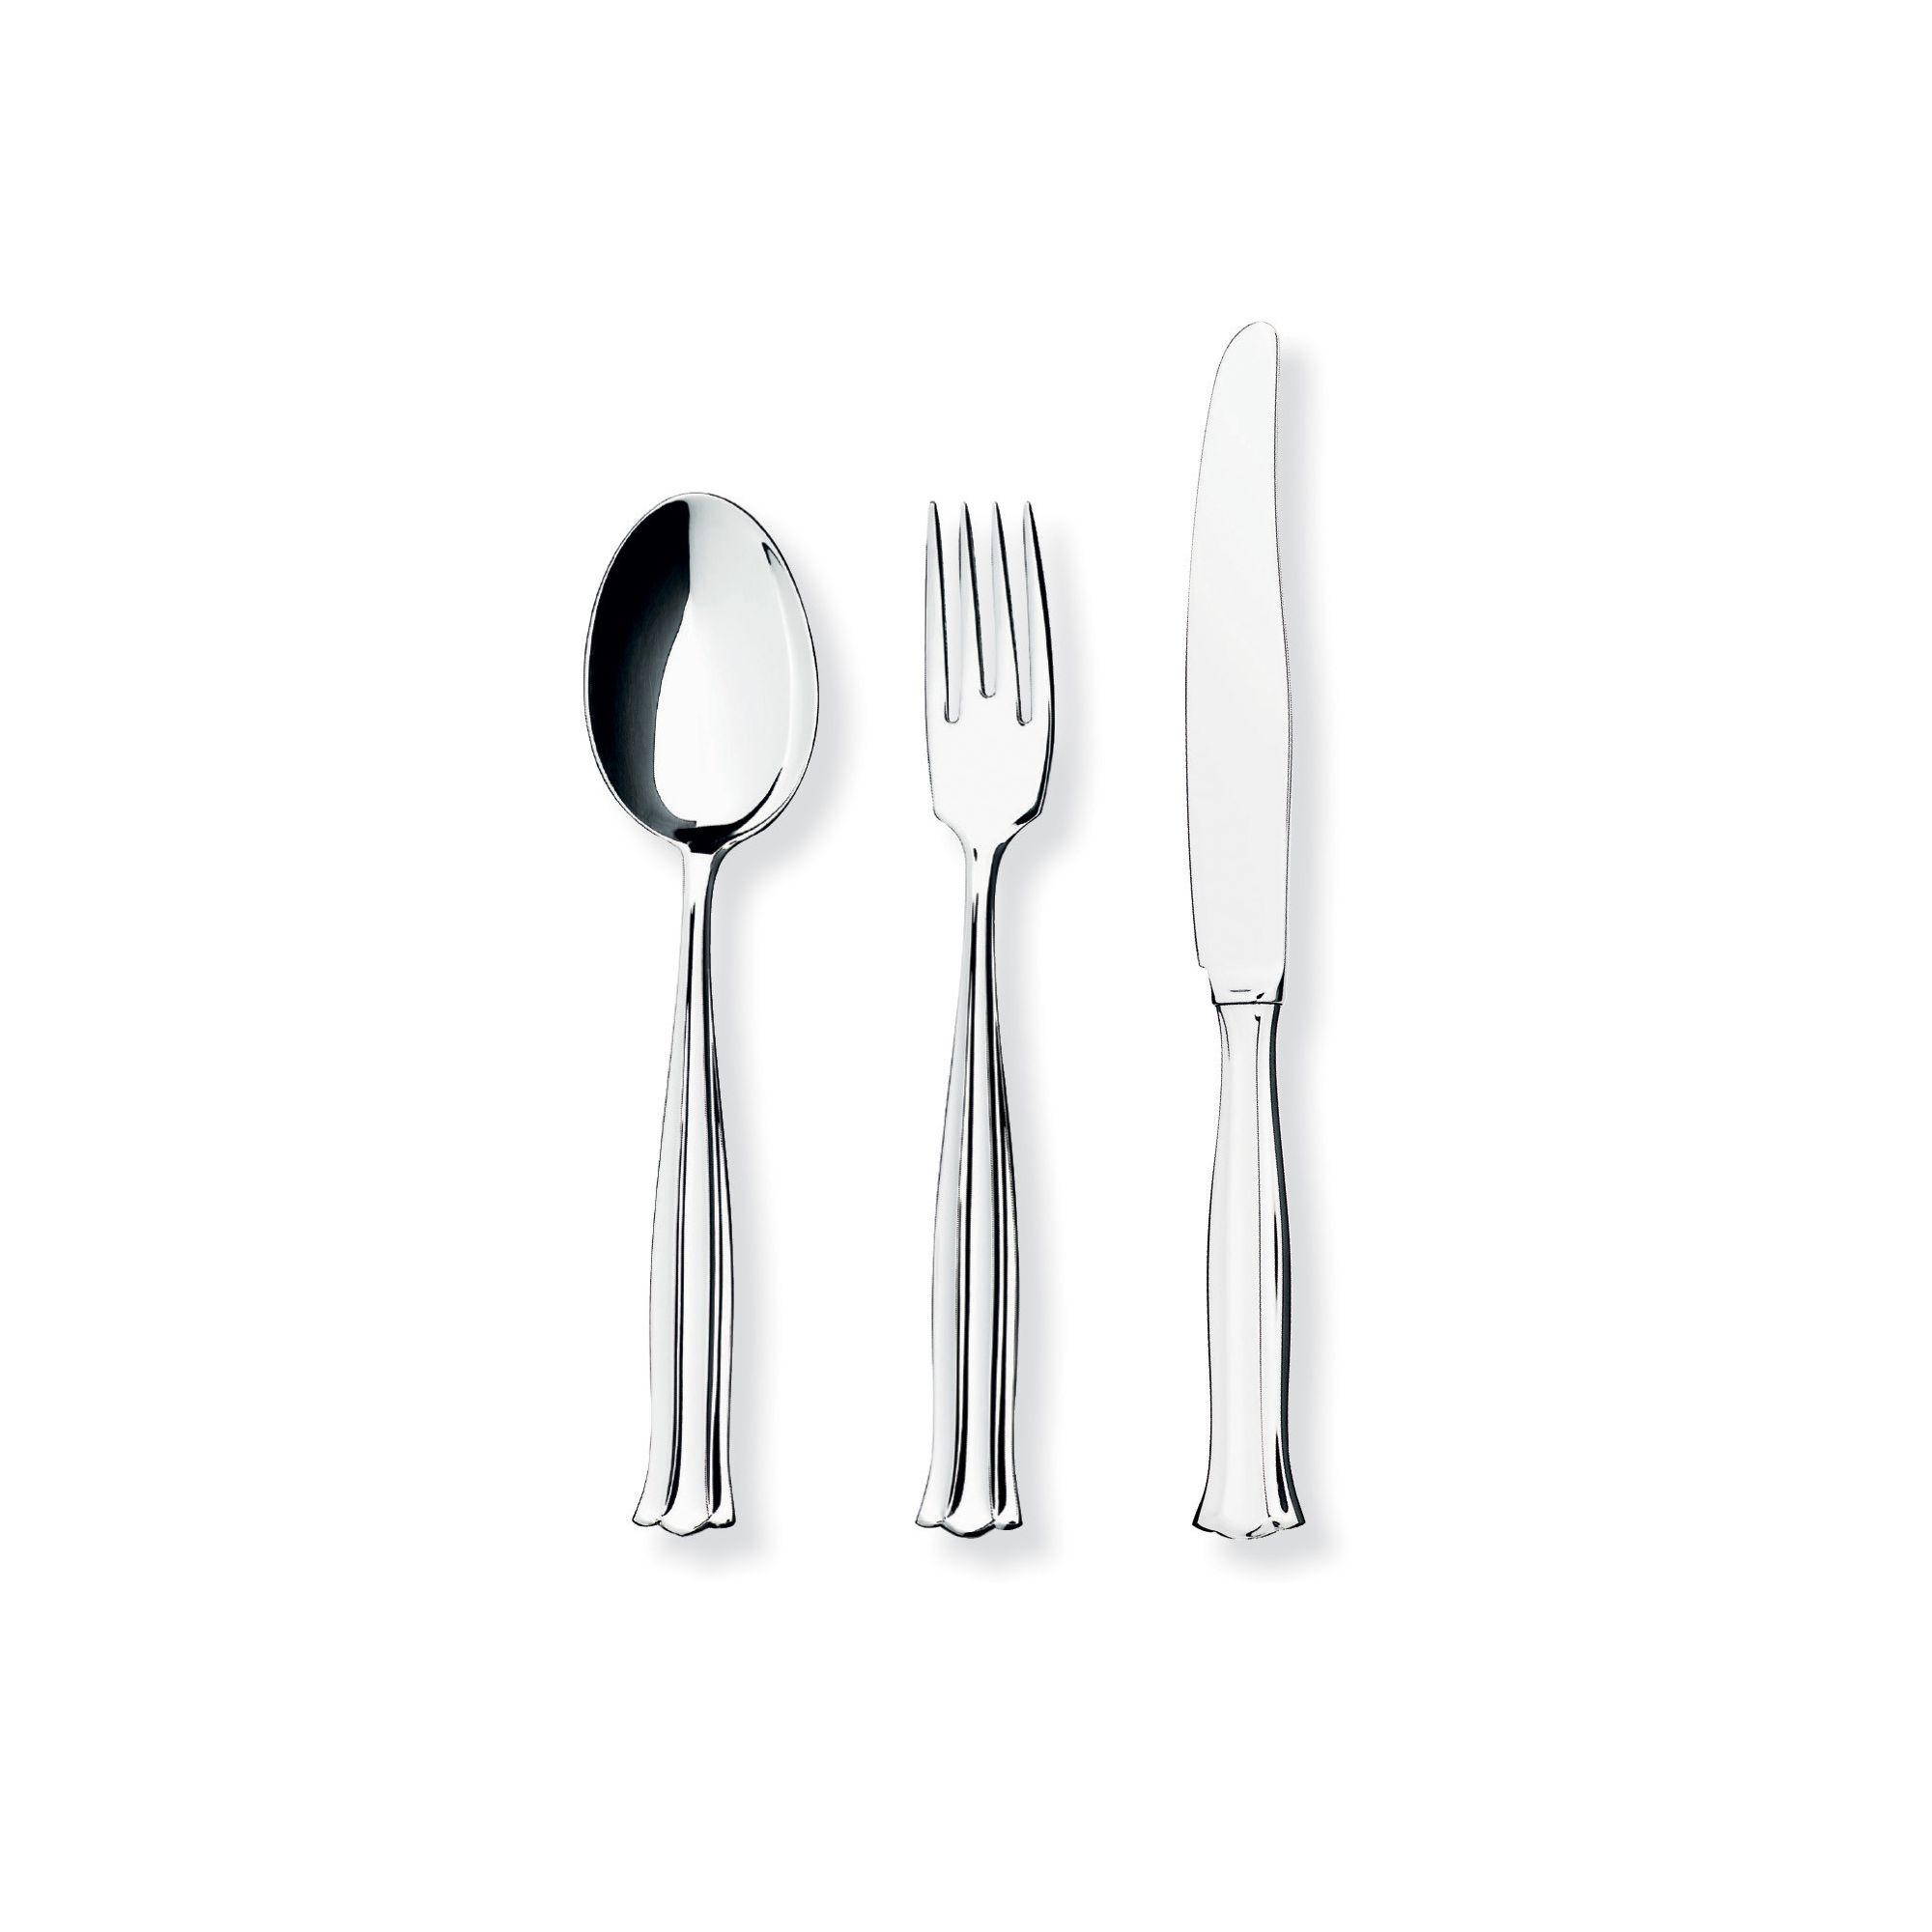 Mema/GAB Birgitta 12 Piece Silver Plated Cutlery Set 3 at Tesco Direct